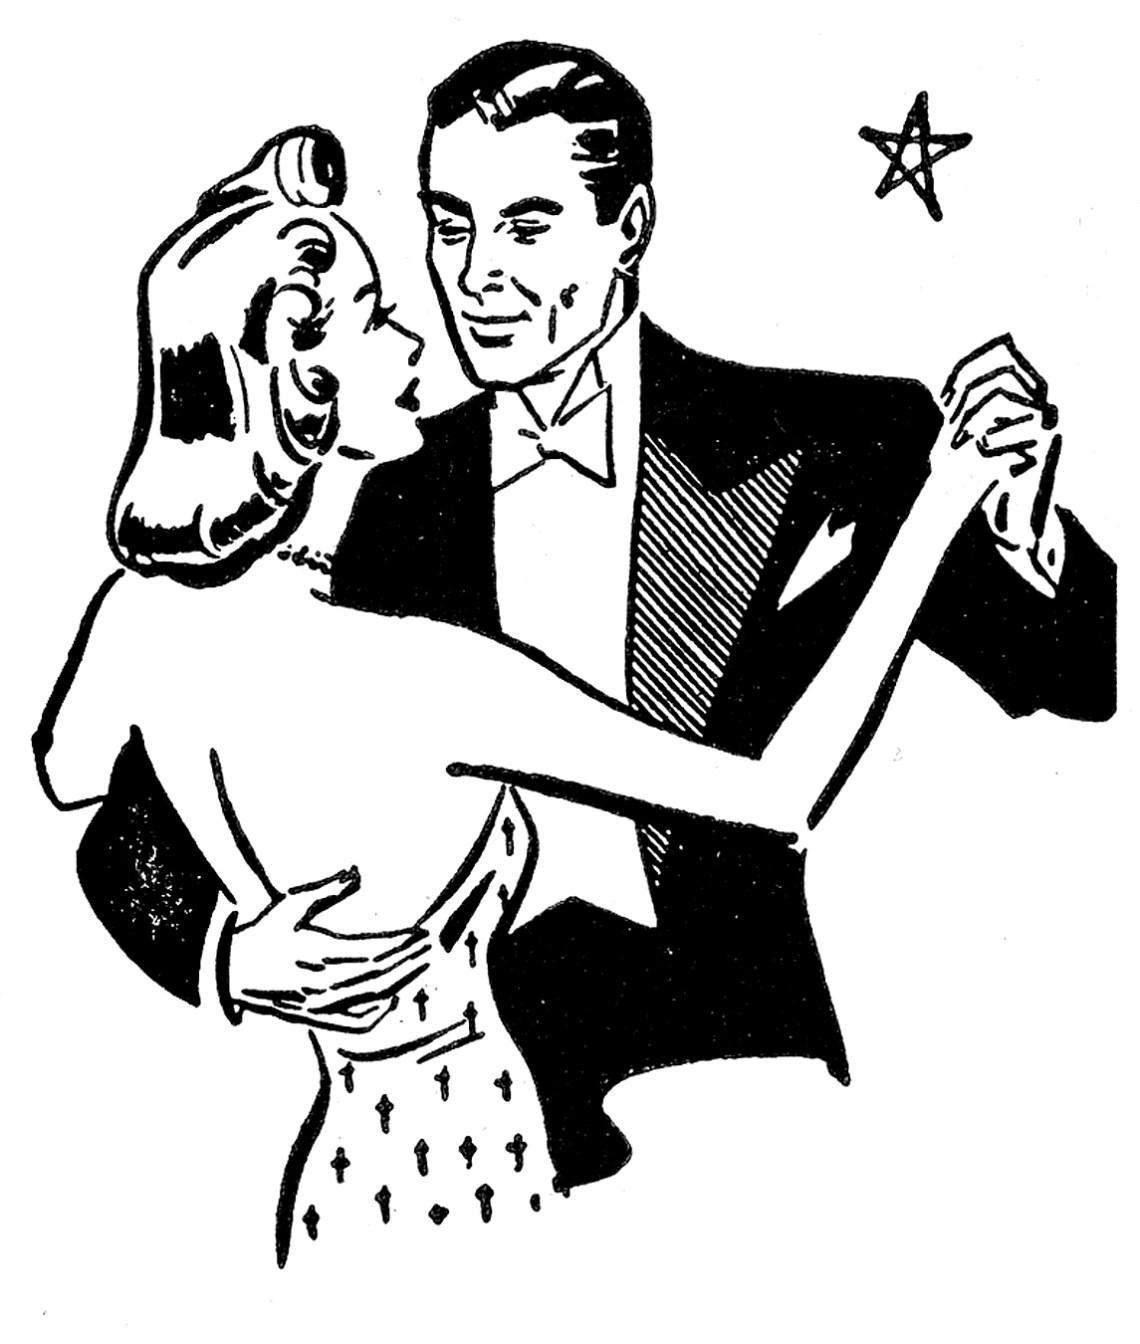 Download dancing-couple-vintage-GraphicsFairy | Couple dancing